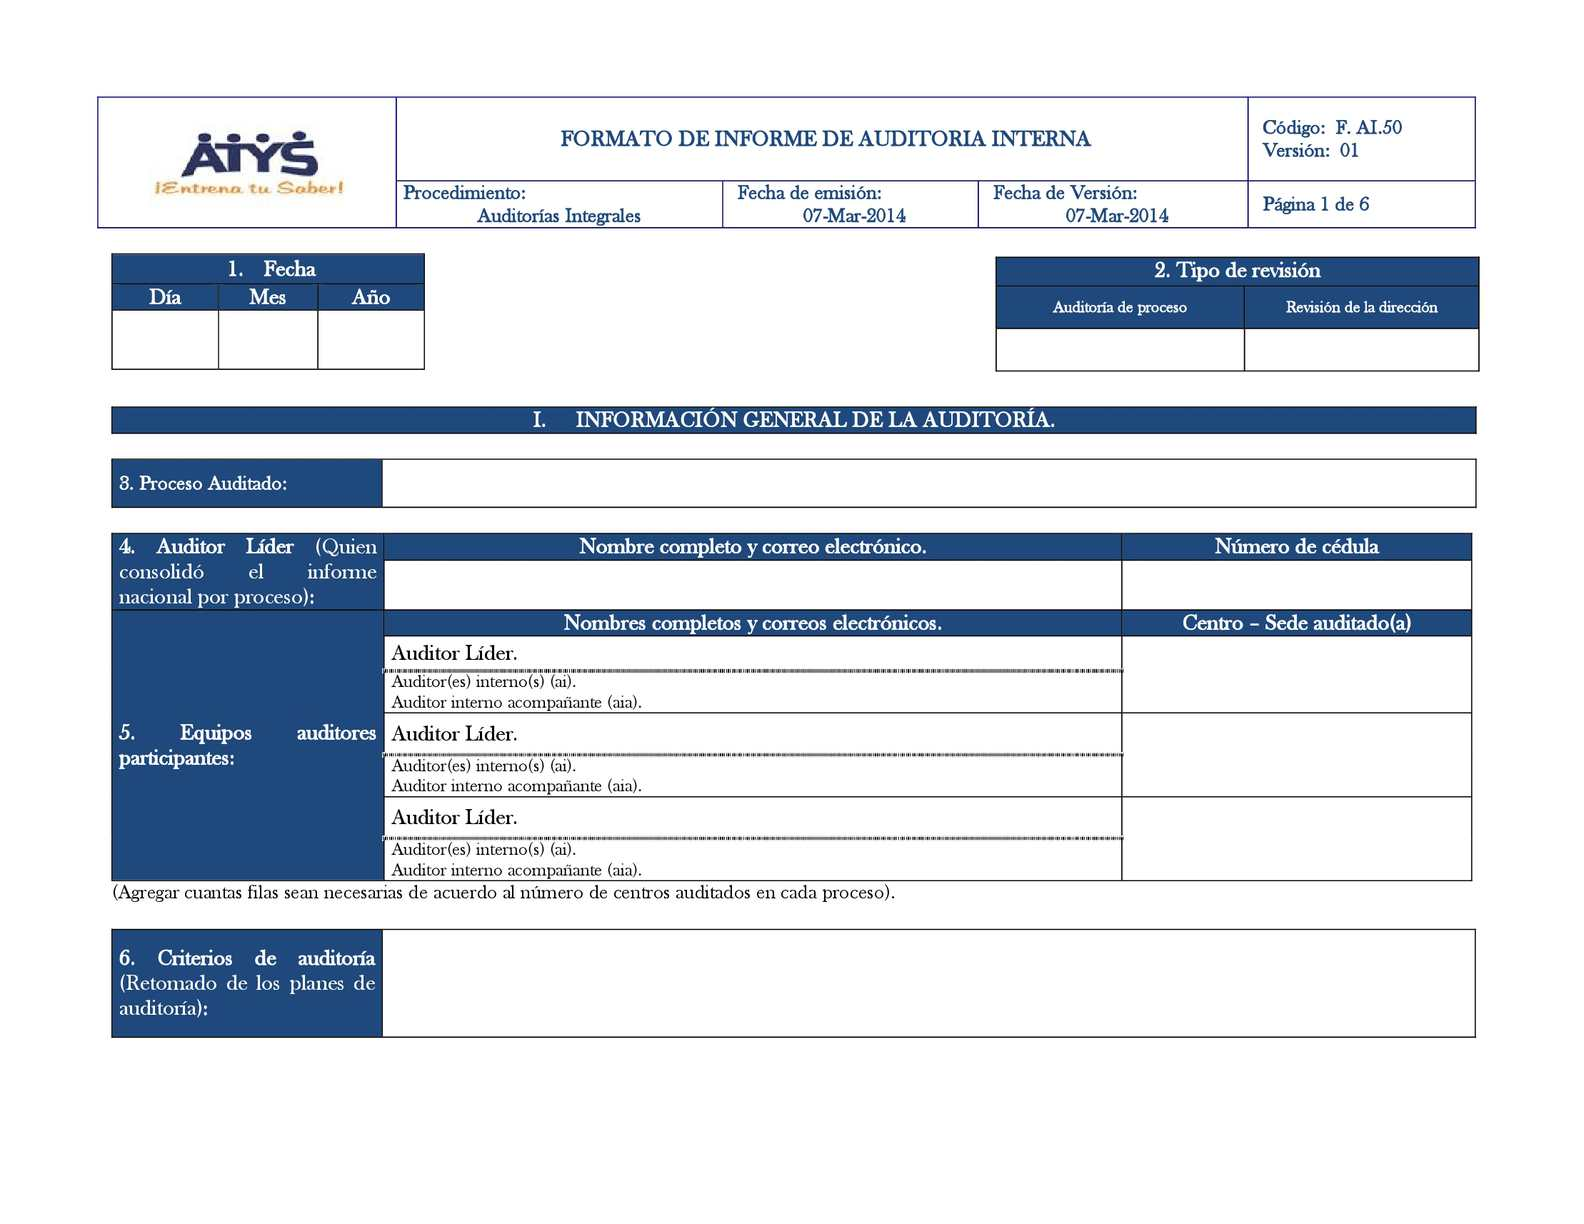 Calaméo - F. AI .50 Formato Informe de Auditoria